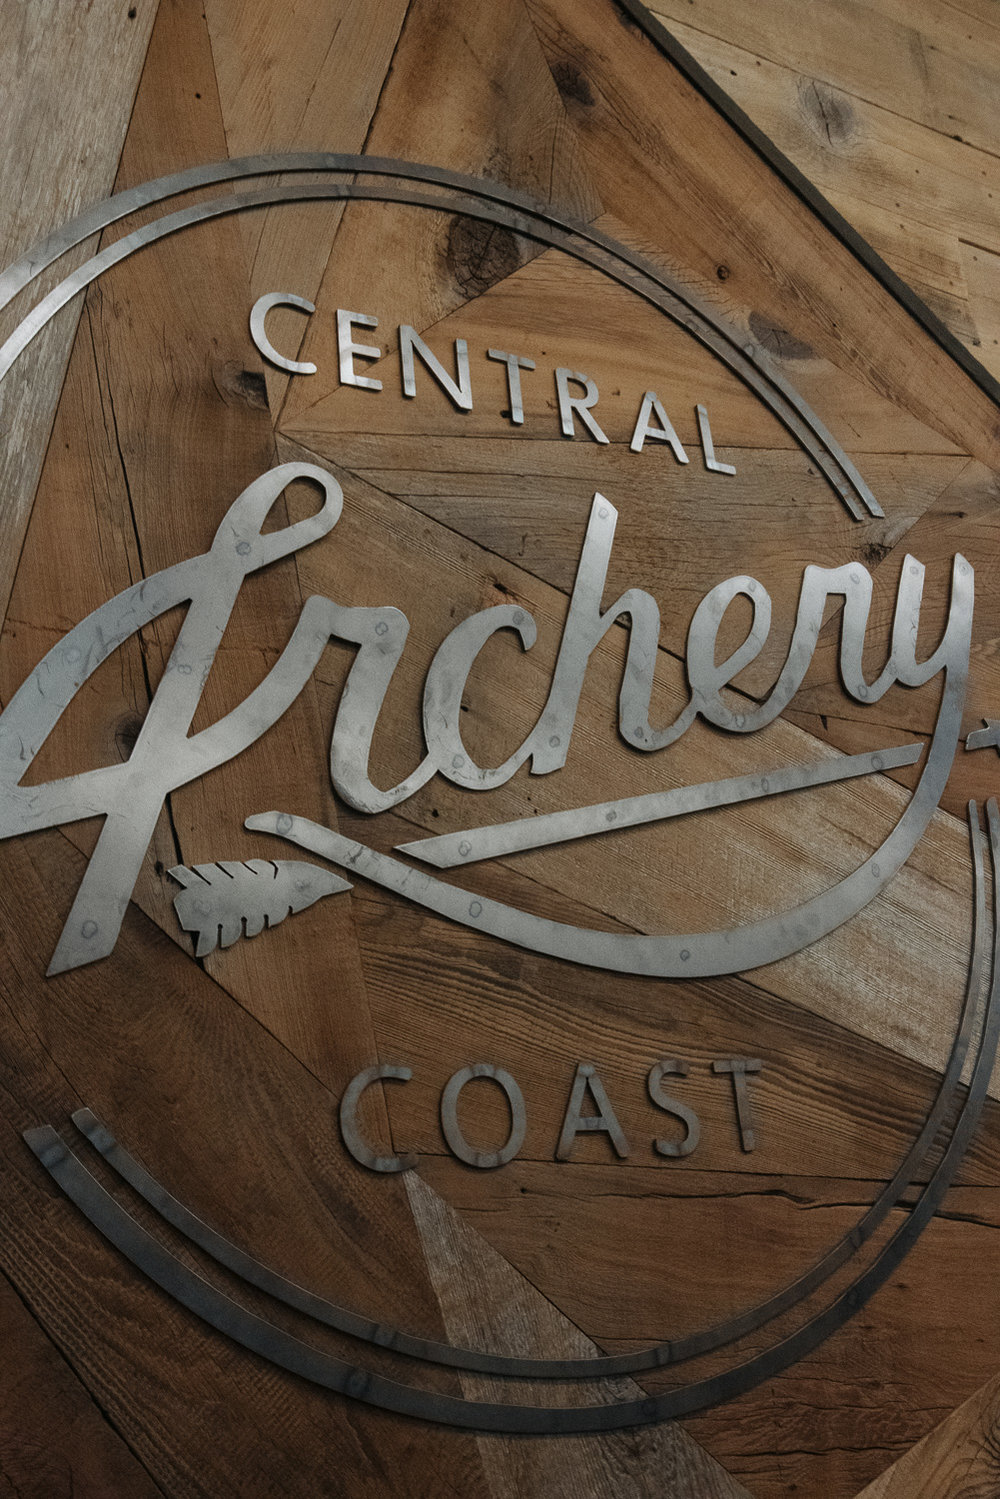 central-coast-archery-23.jpg